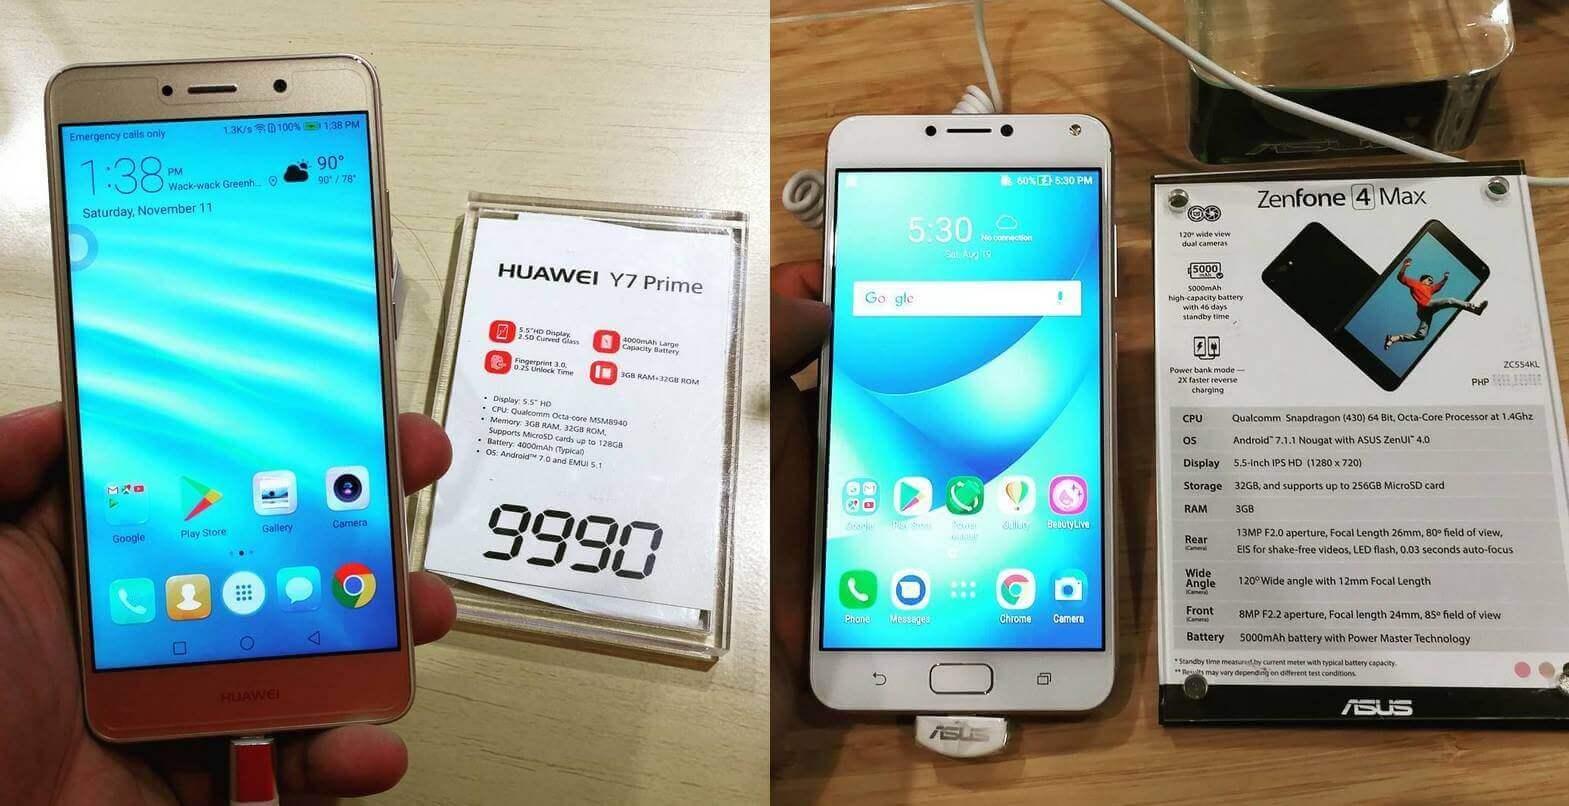 Huawei Y7 Prime versus ASUS Zenfone 4 Max